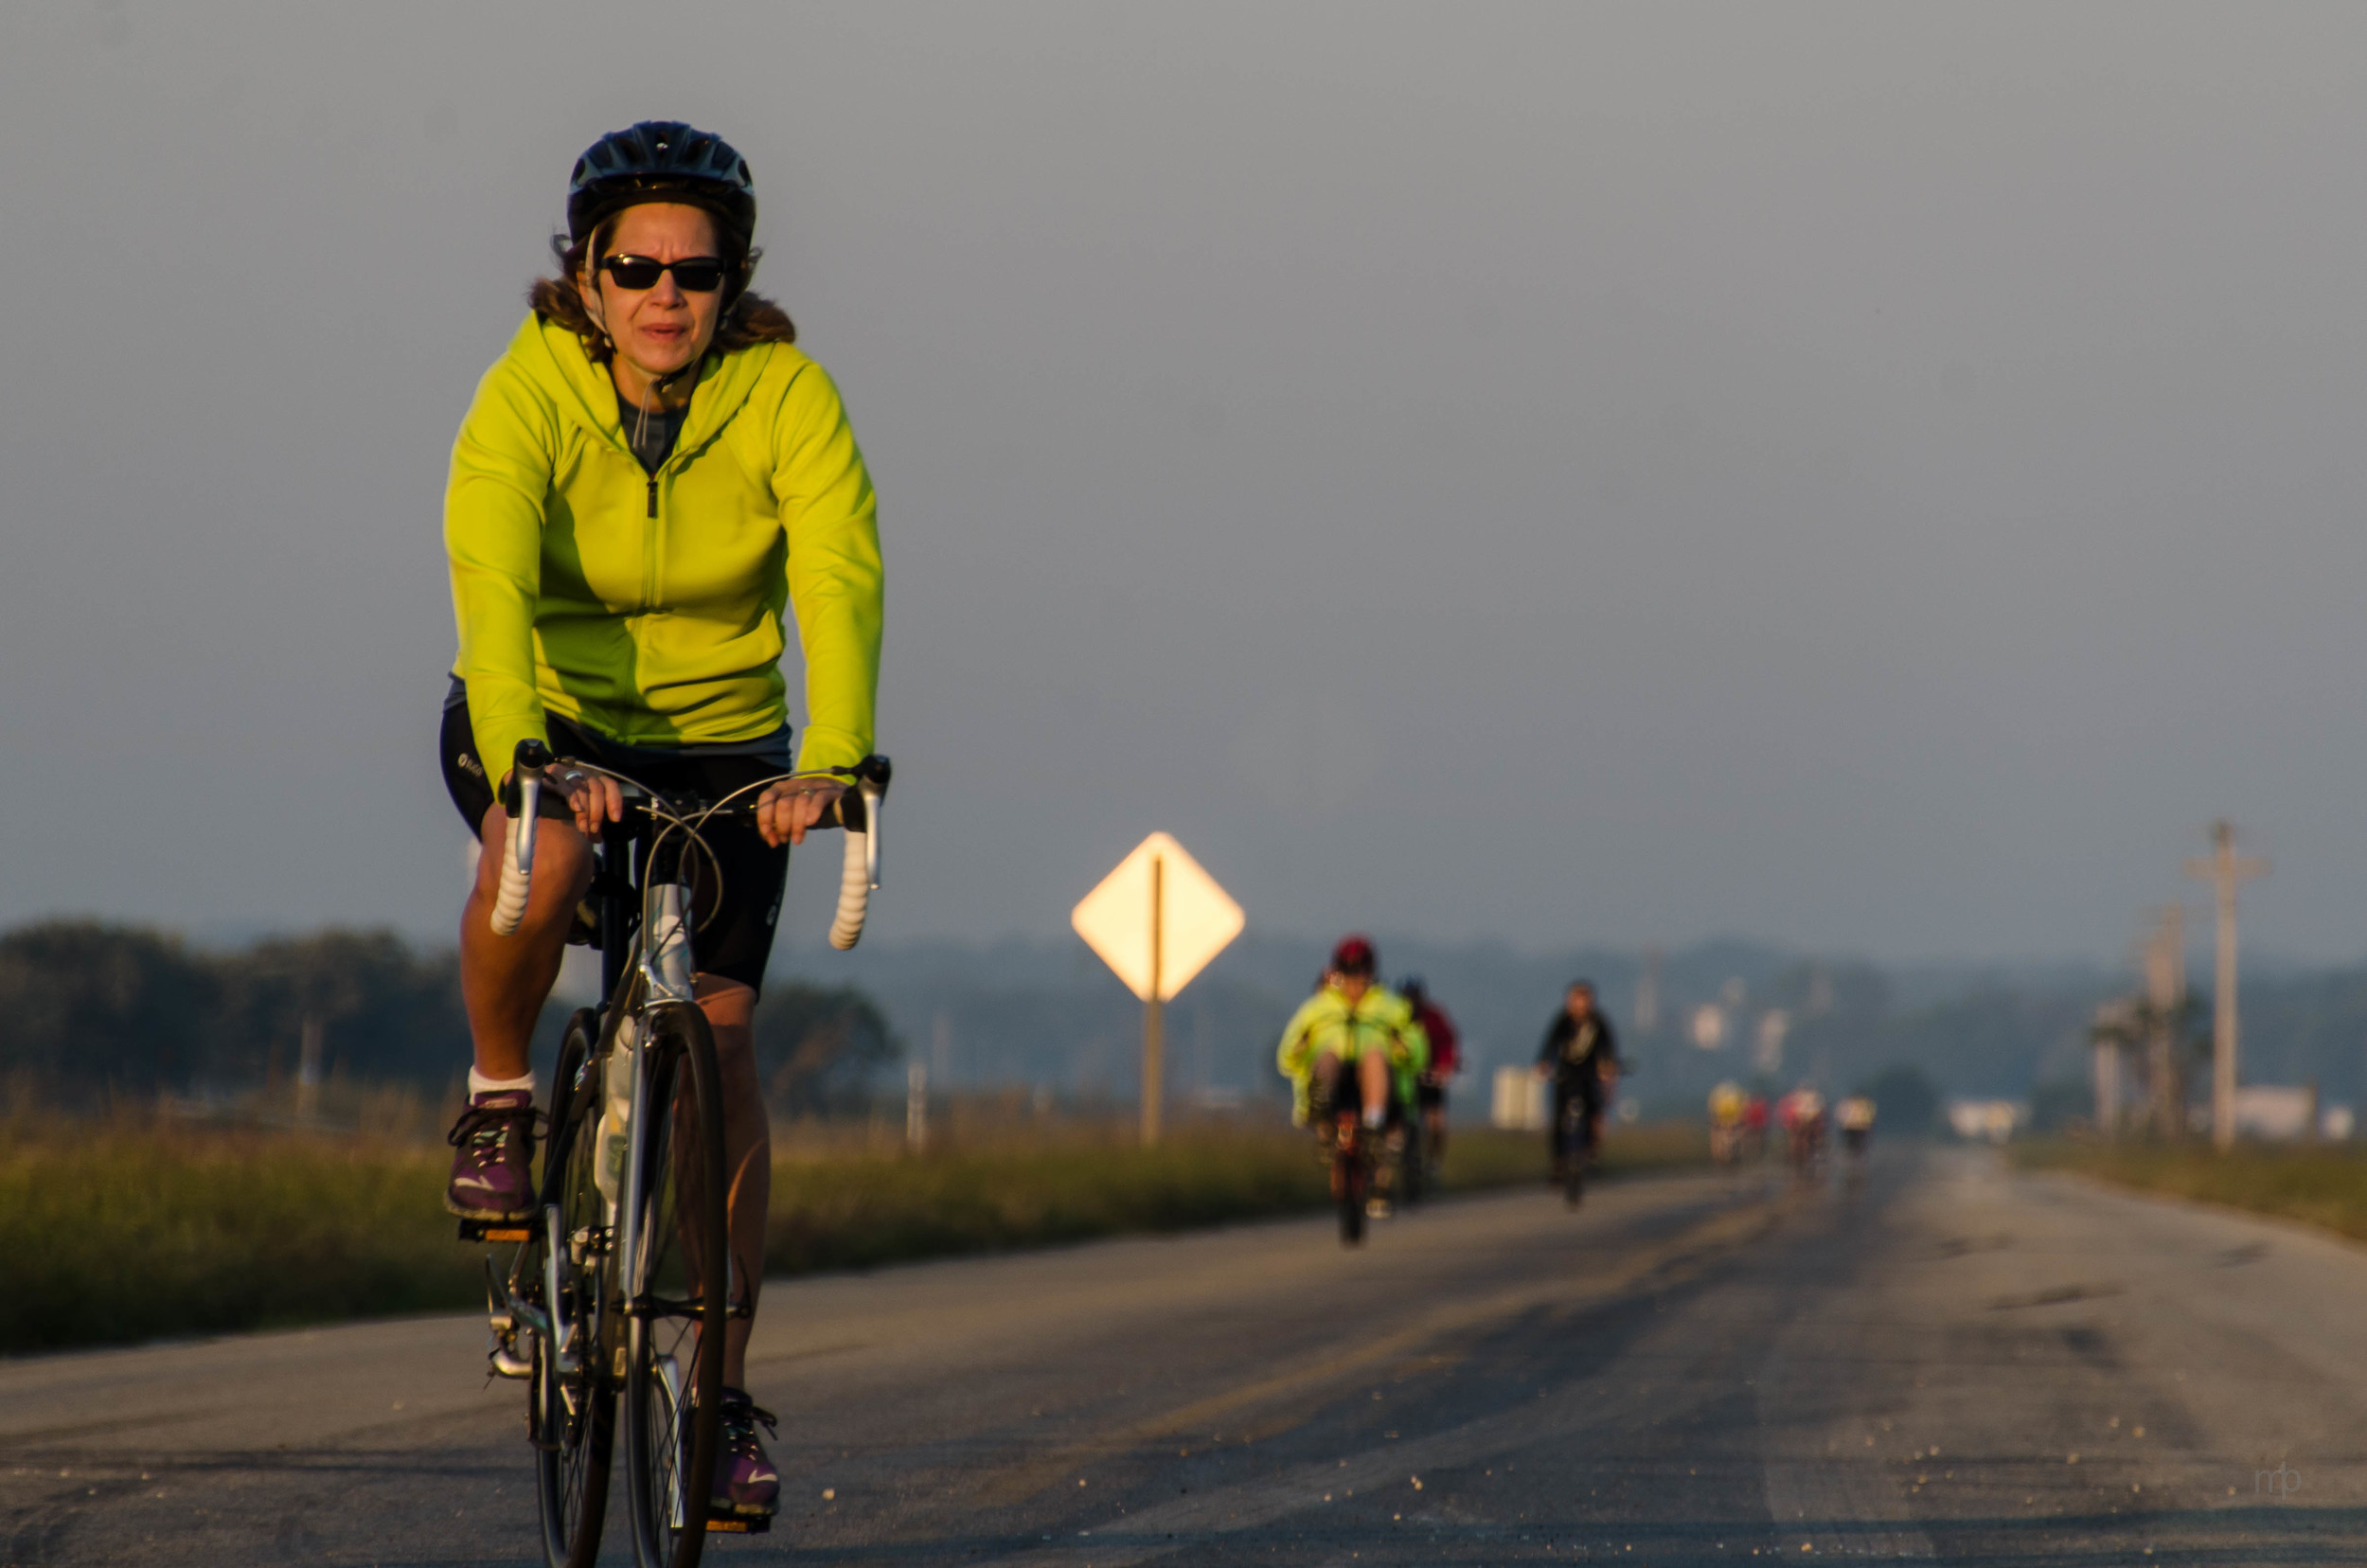 Yellow Brick Road Bike Rider. Nikon D7000, Tamron 18-270, ISO100, 270 mm, f/8.0, 1/160 sec